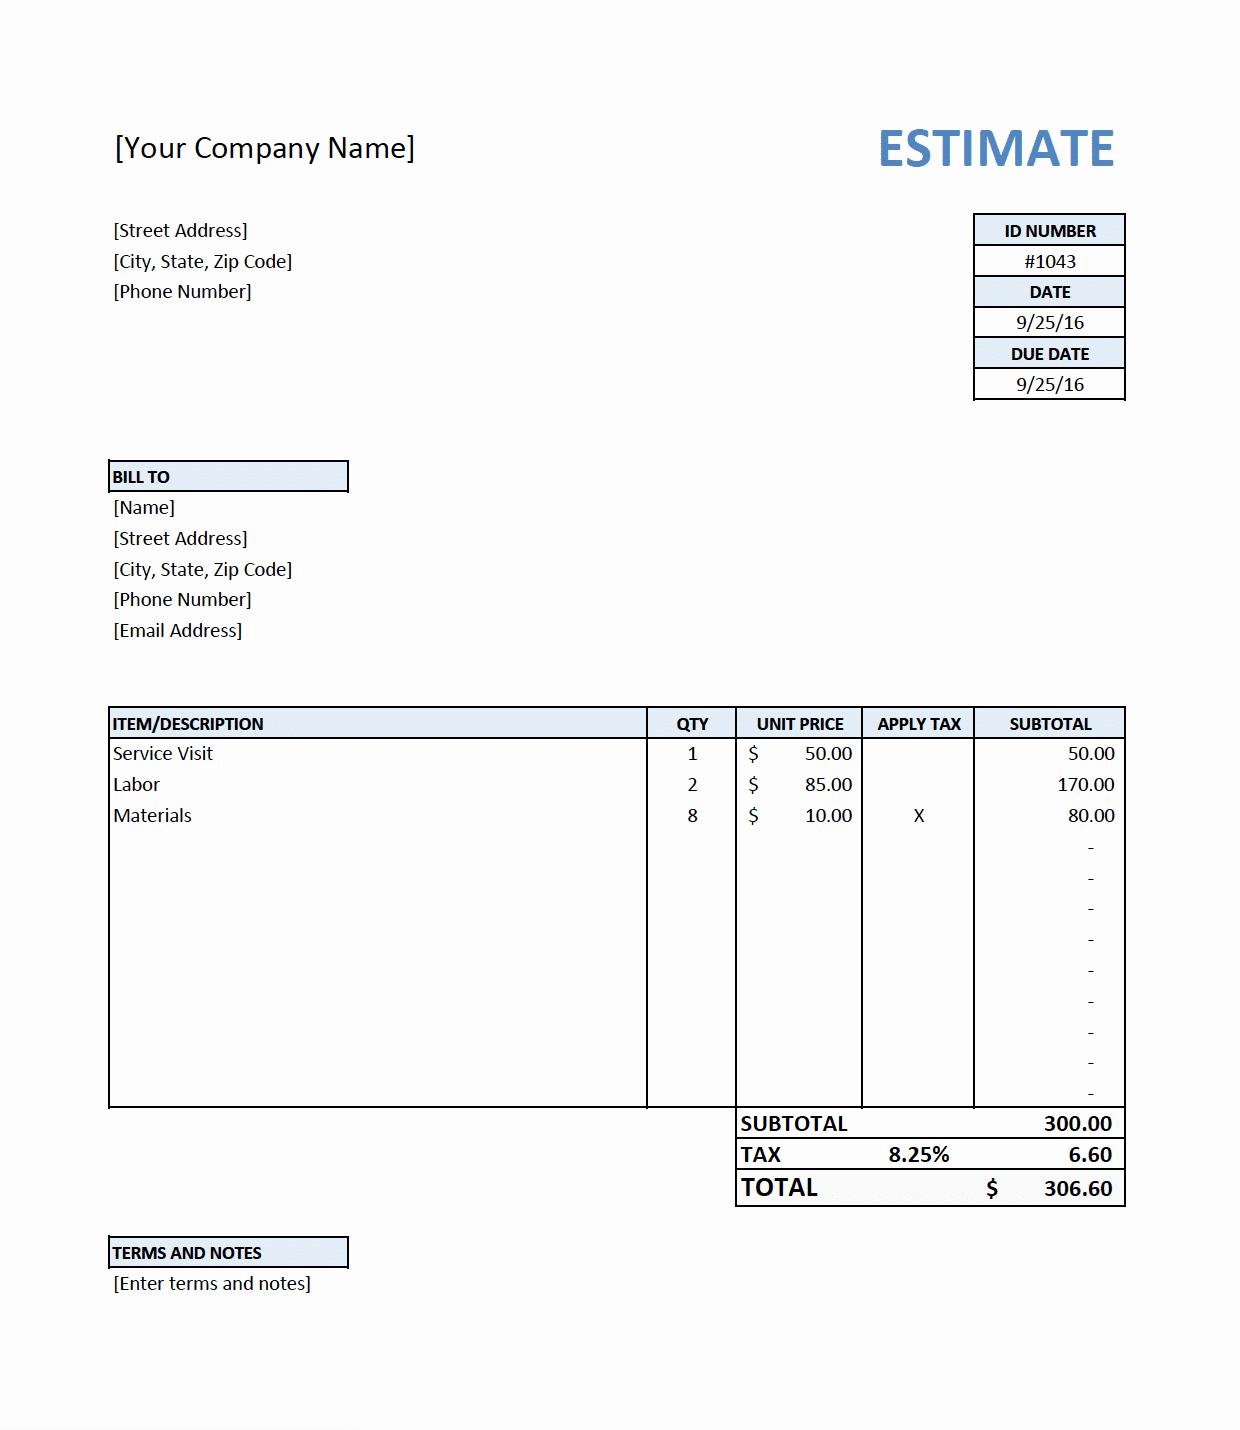 Job Estimate Template Pdf Unique Free Estimate Template for Contractors